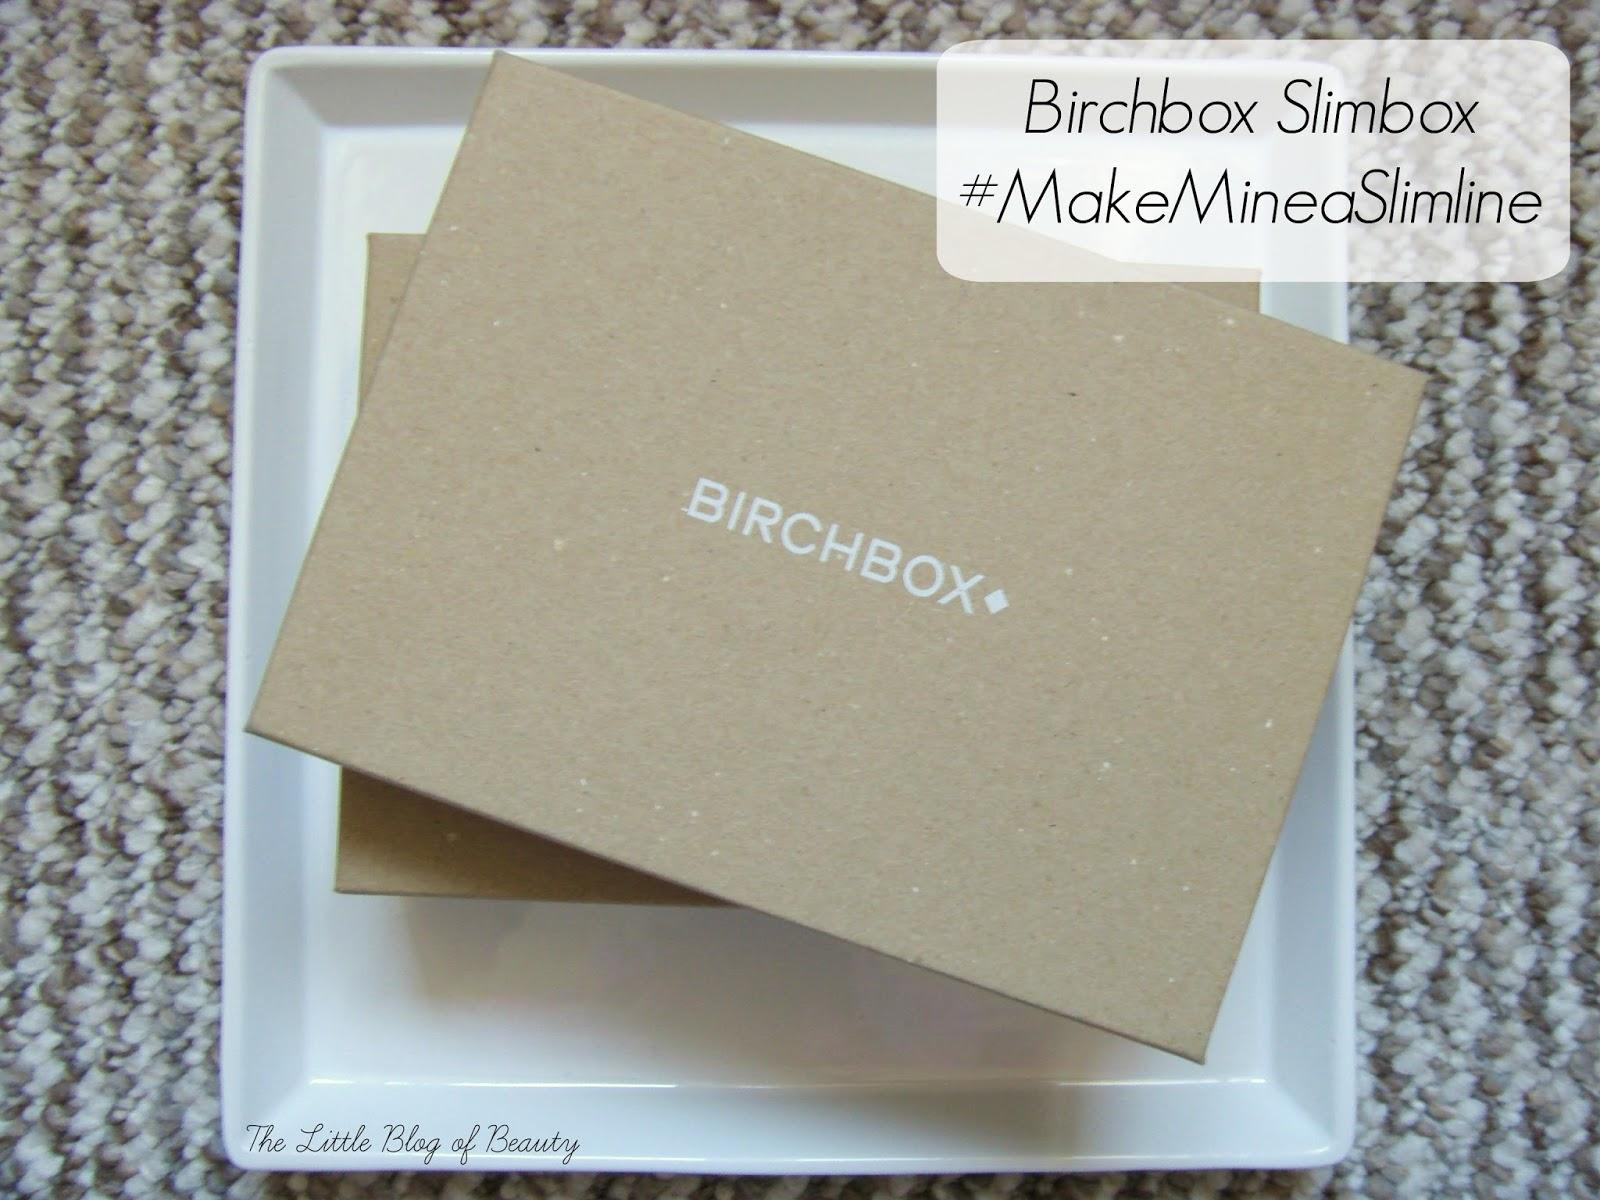 Birchbox Slimbox #MakeMineaSlimline